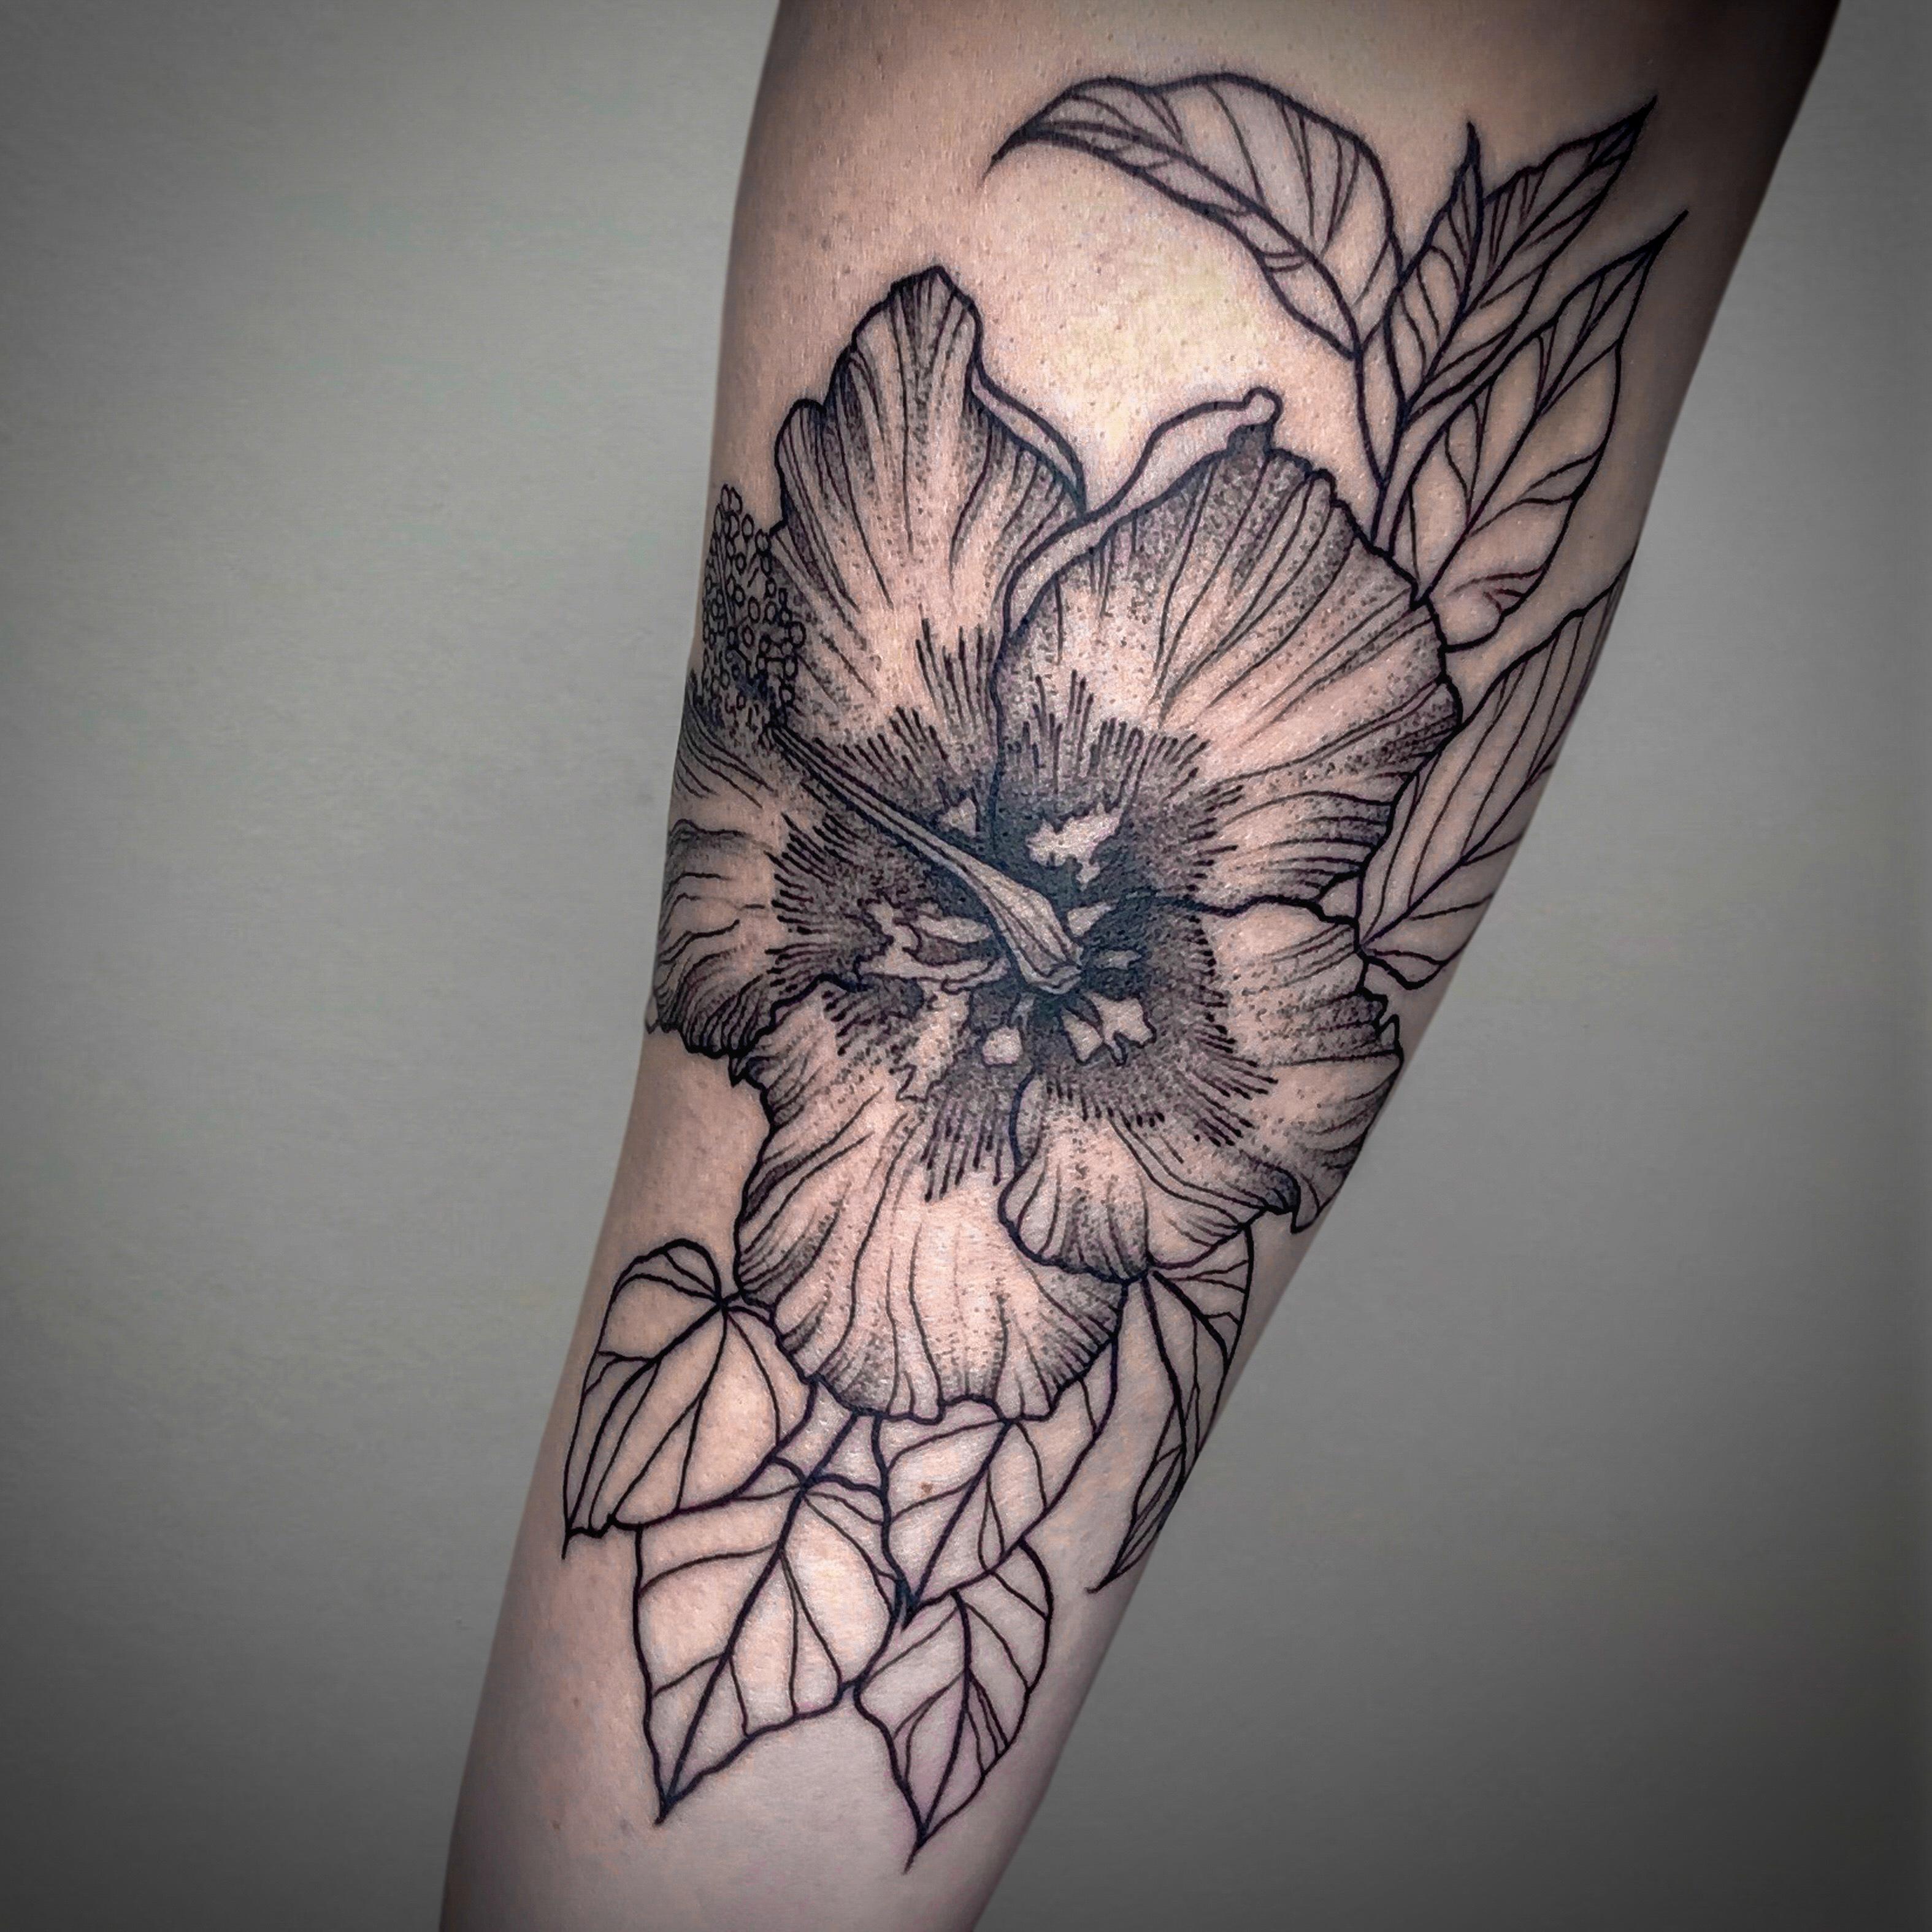 Inksearch tattoo Joanna Strojny